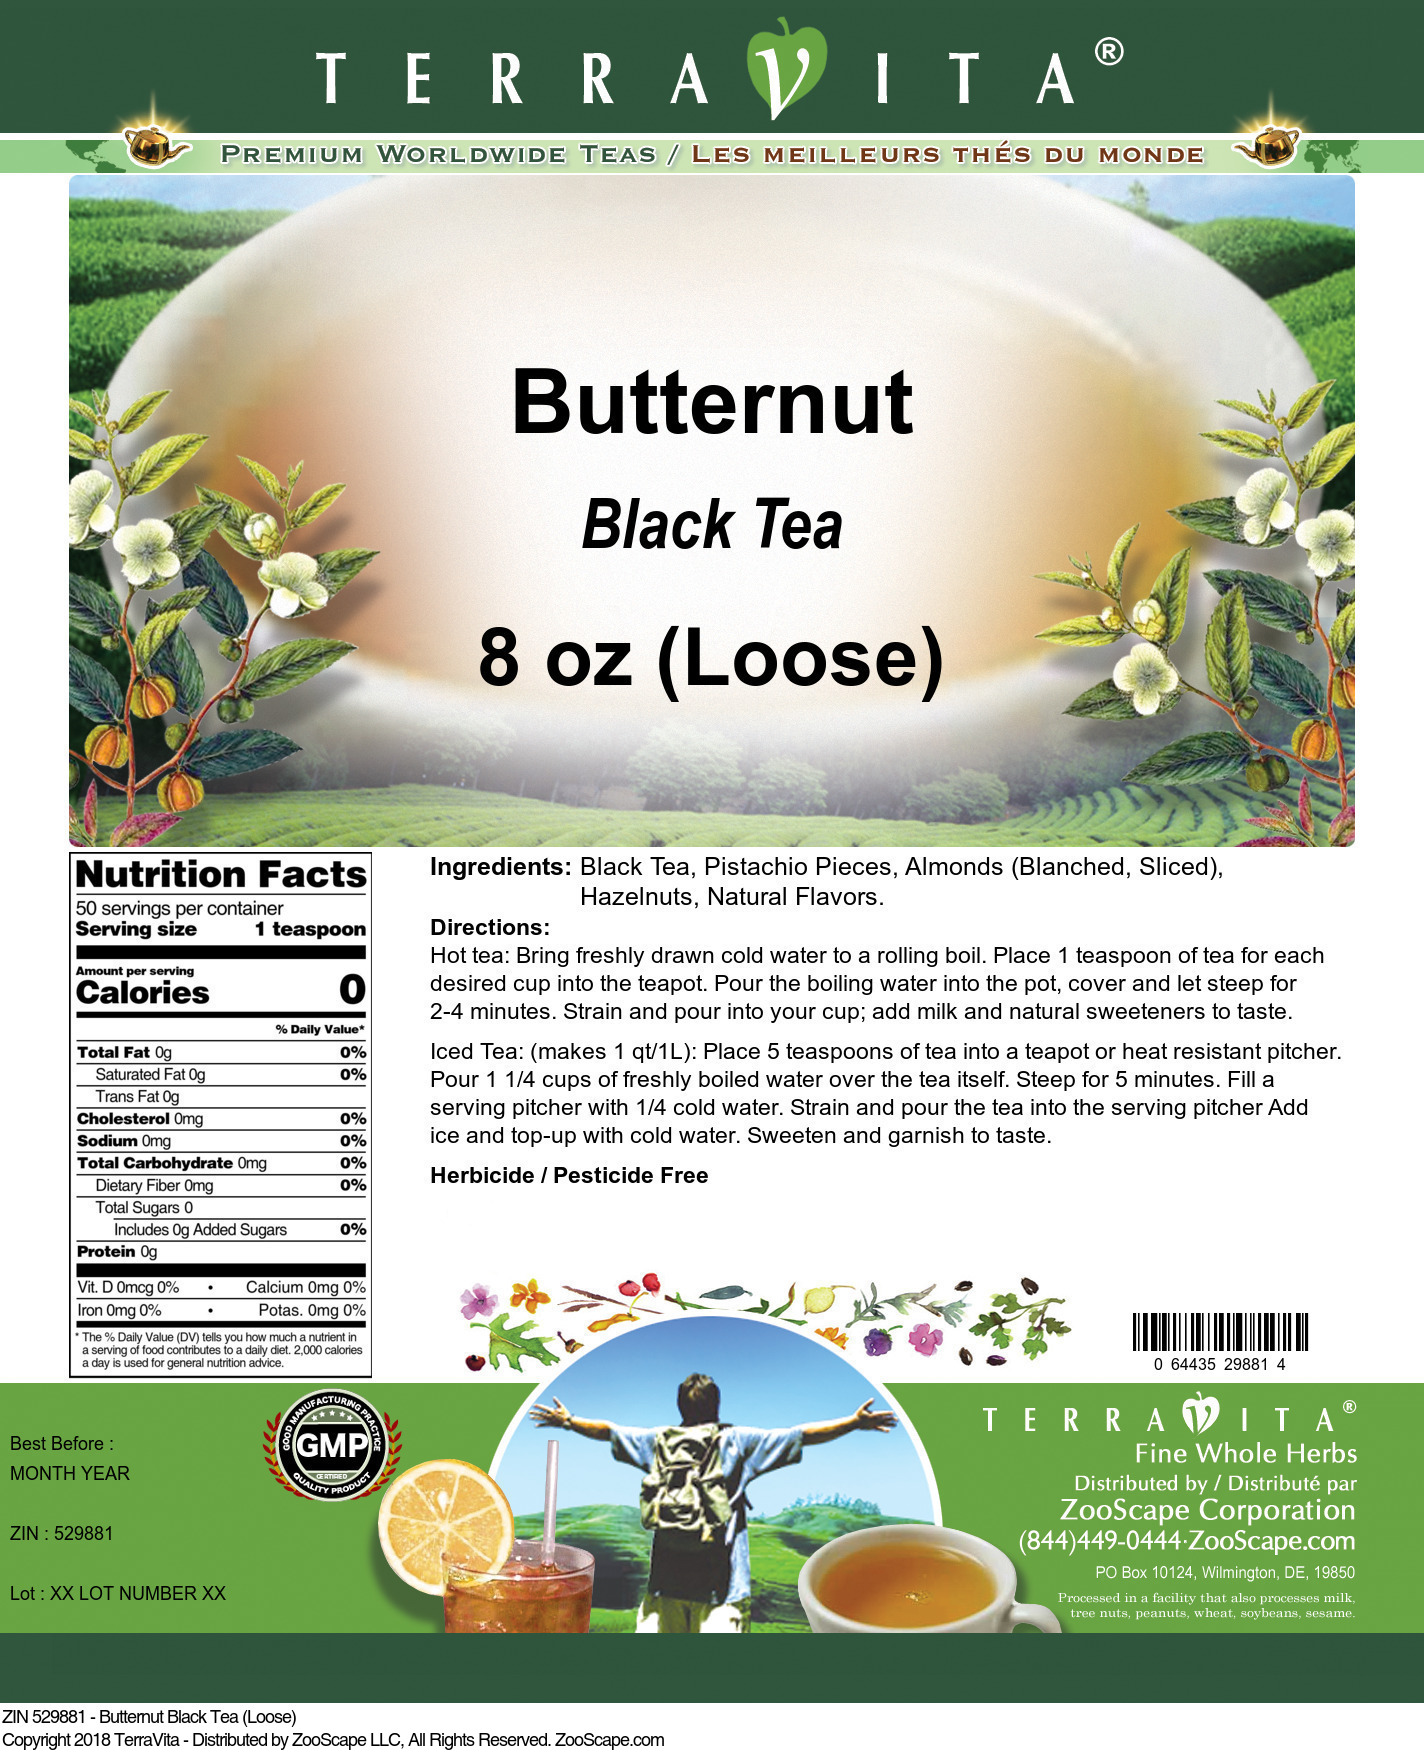 Butternut Black Tea